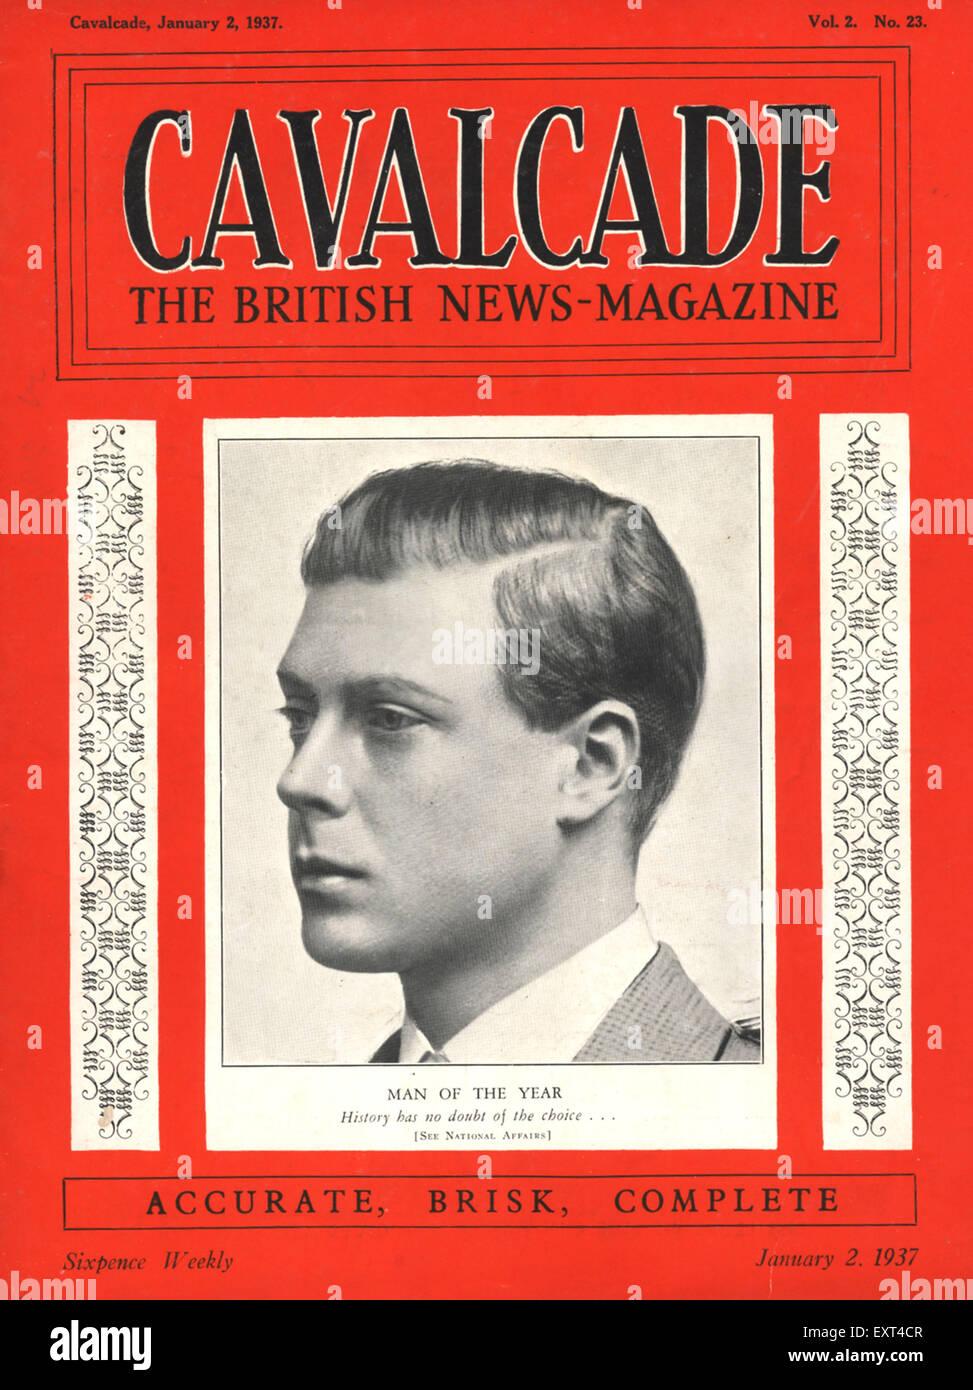 Image result for cavalcade magazine  1937 epilepsy